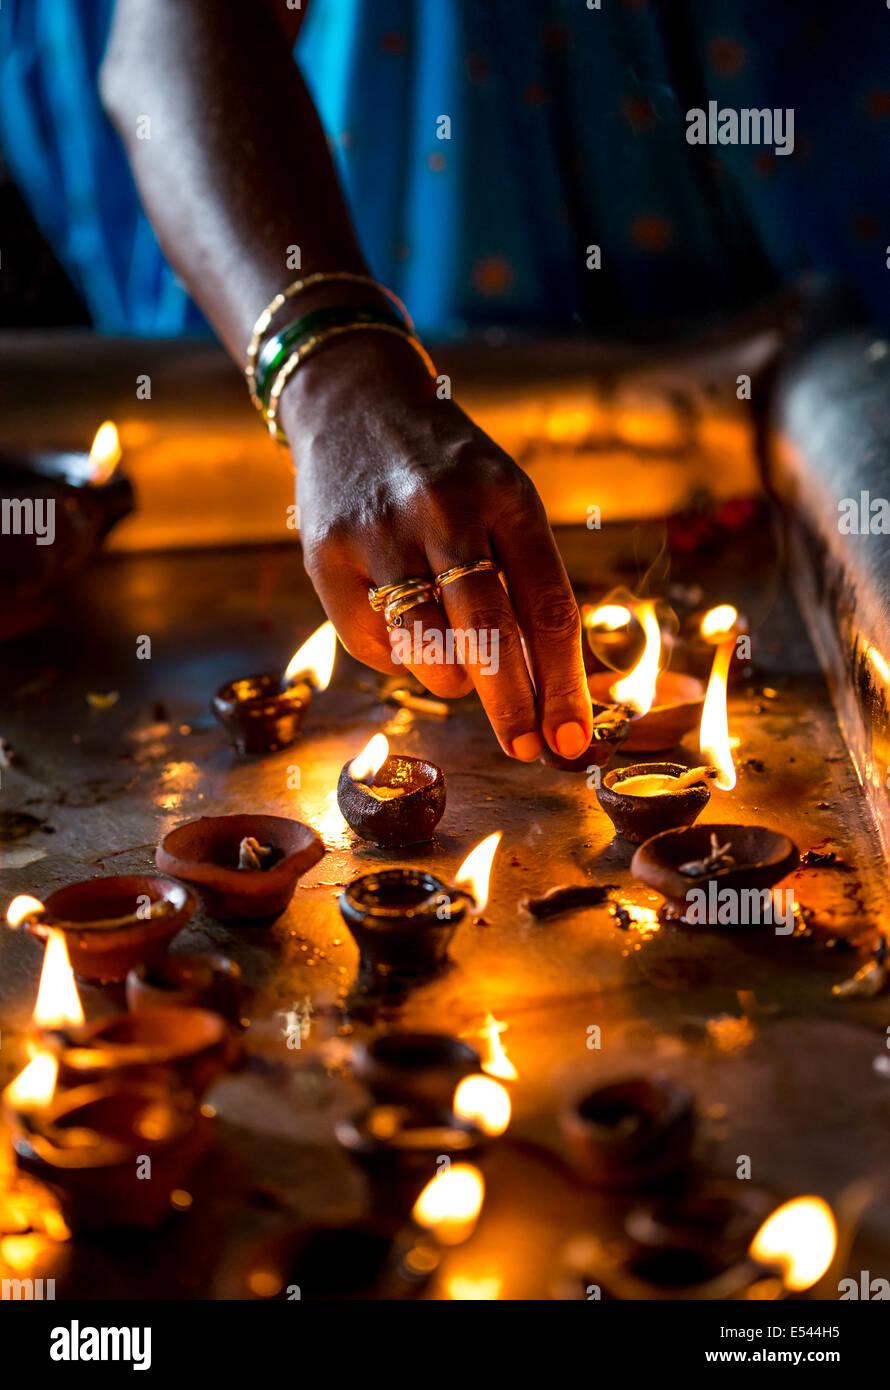 Velas Acesas no templo indiano. O Diwali - o festival das luzes. Imagens de Stock